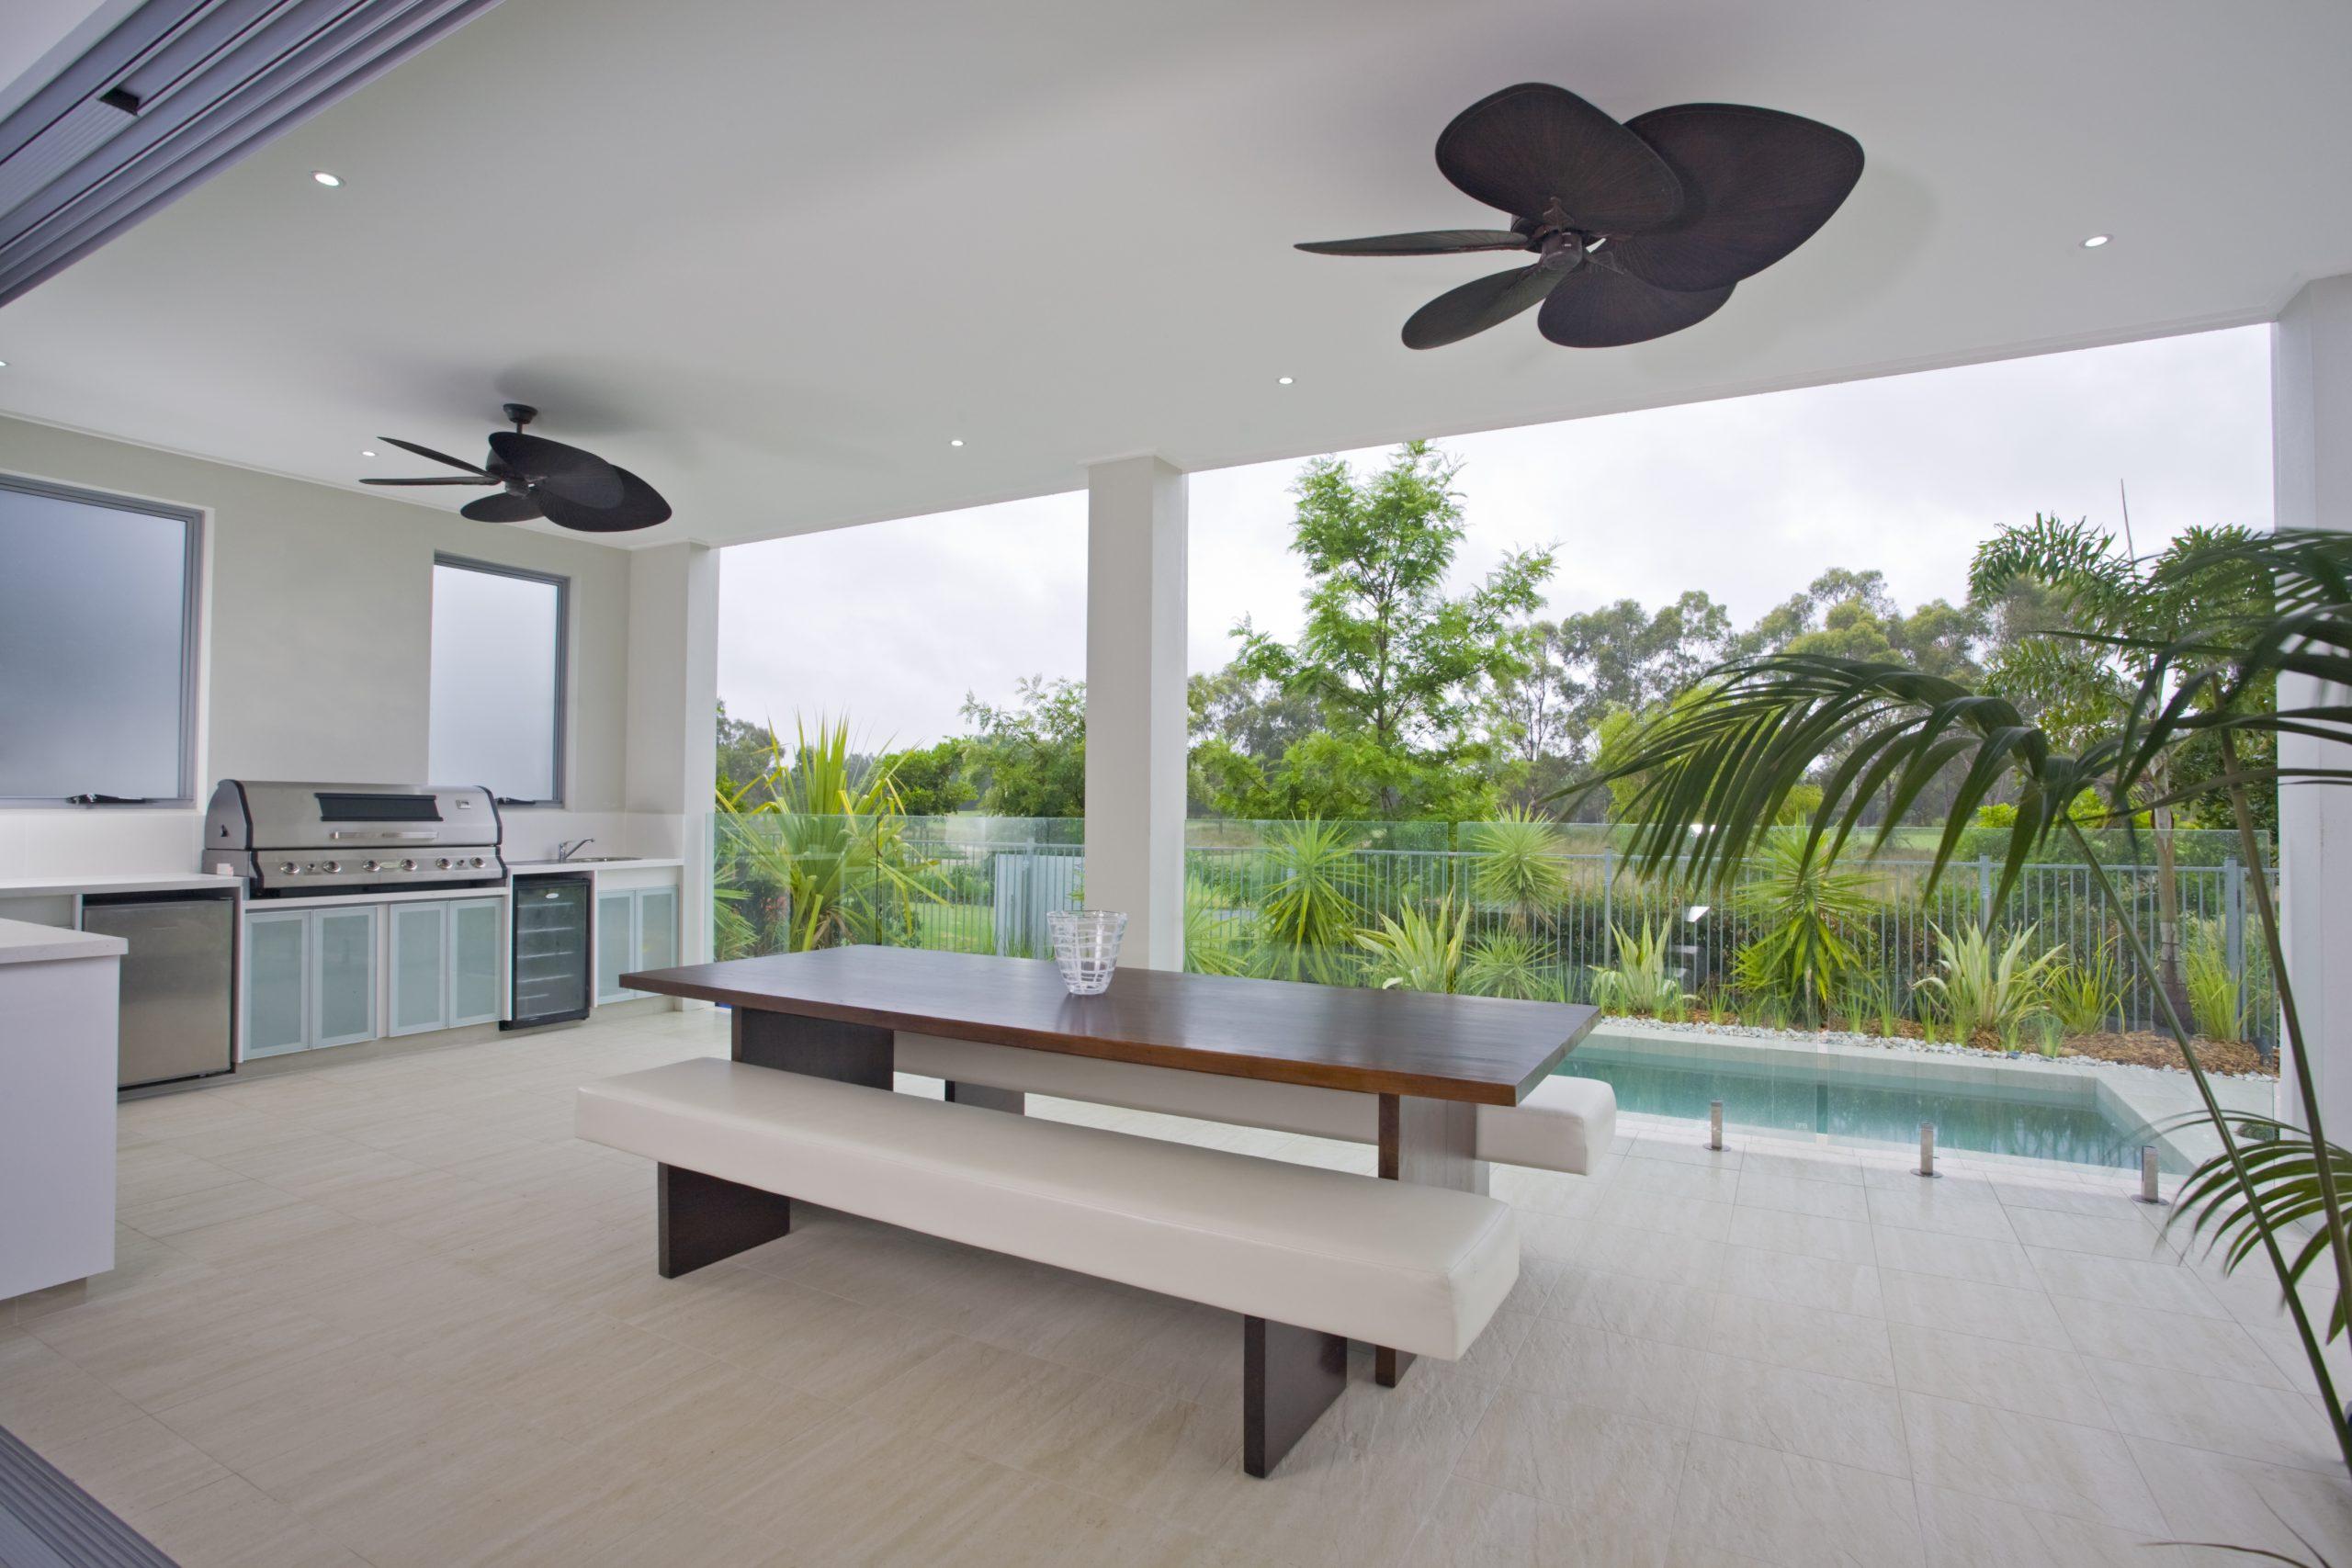 Pool deck builder Corpus Chrisit